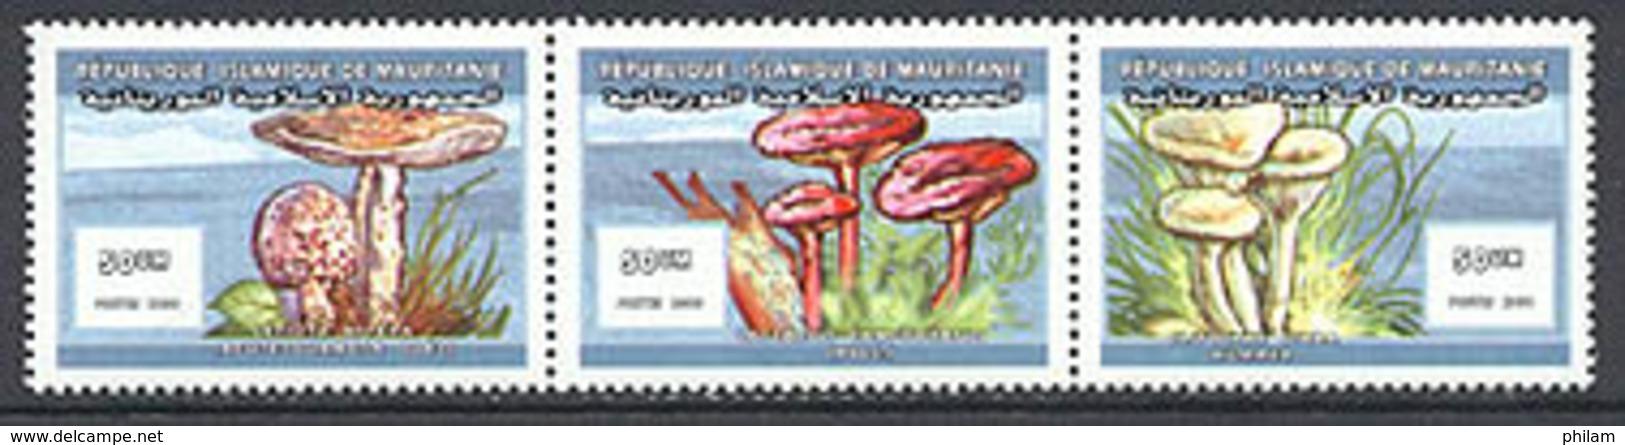 MAURITANIE 2000 - Les Champignons - 3 V. Se Tenant - 687/89 - Mauritania (1960-...)